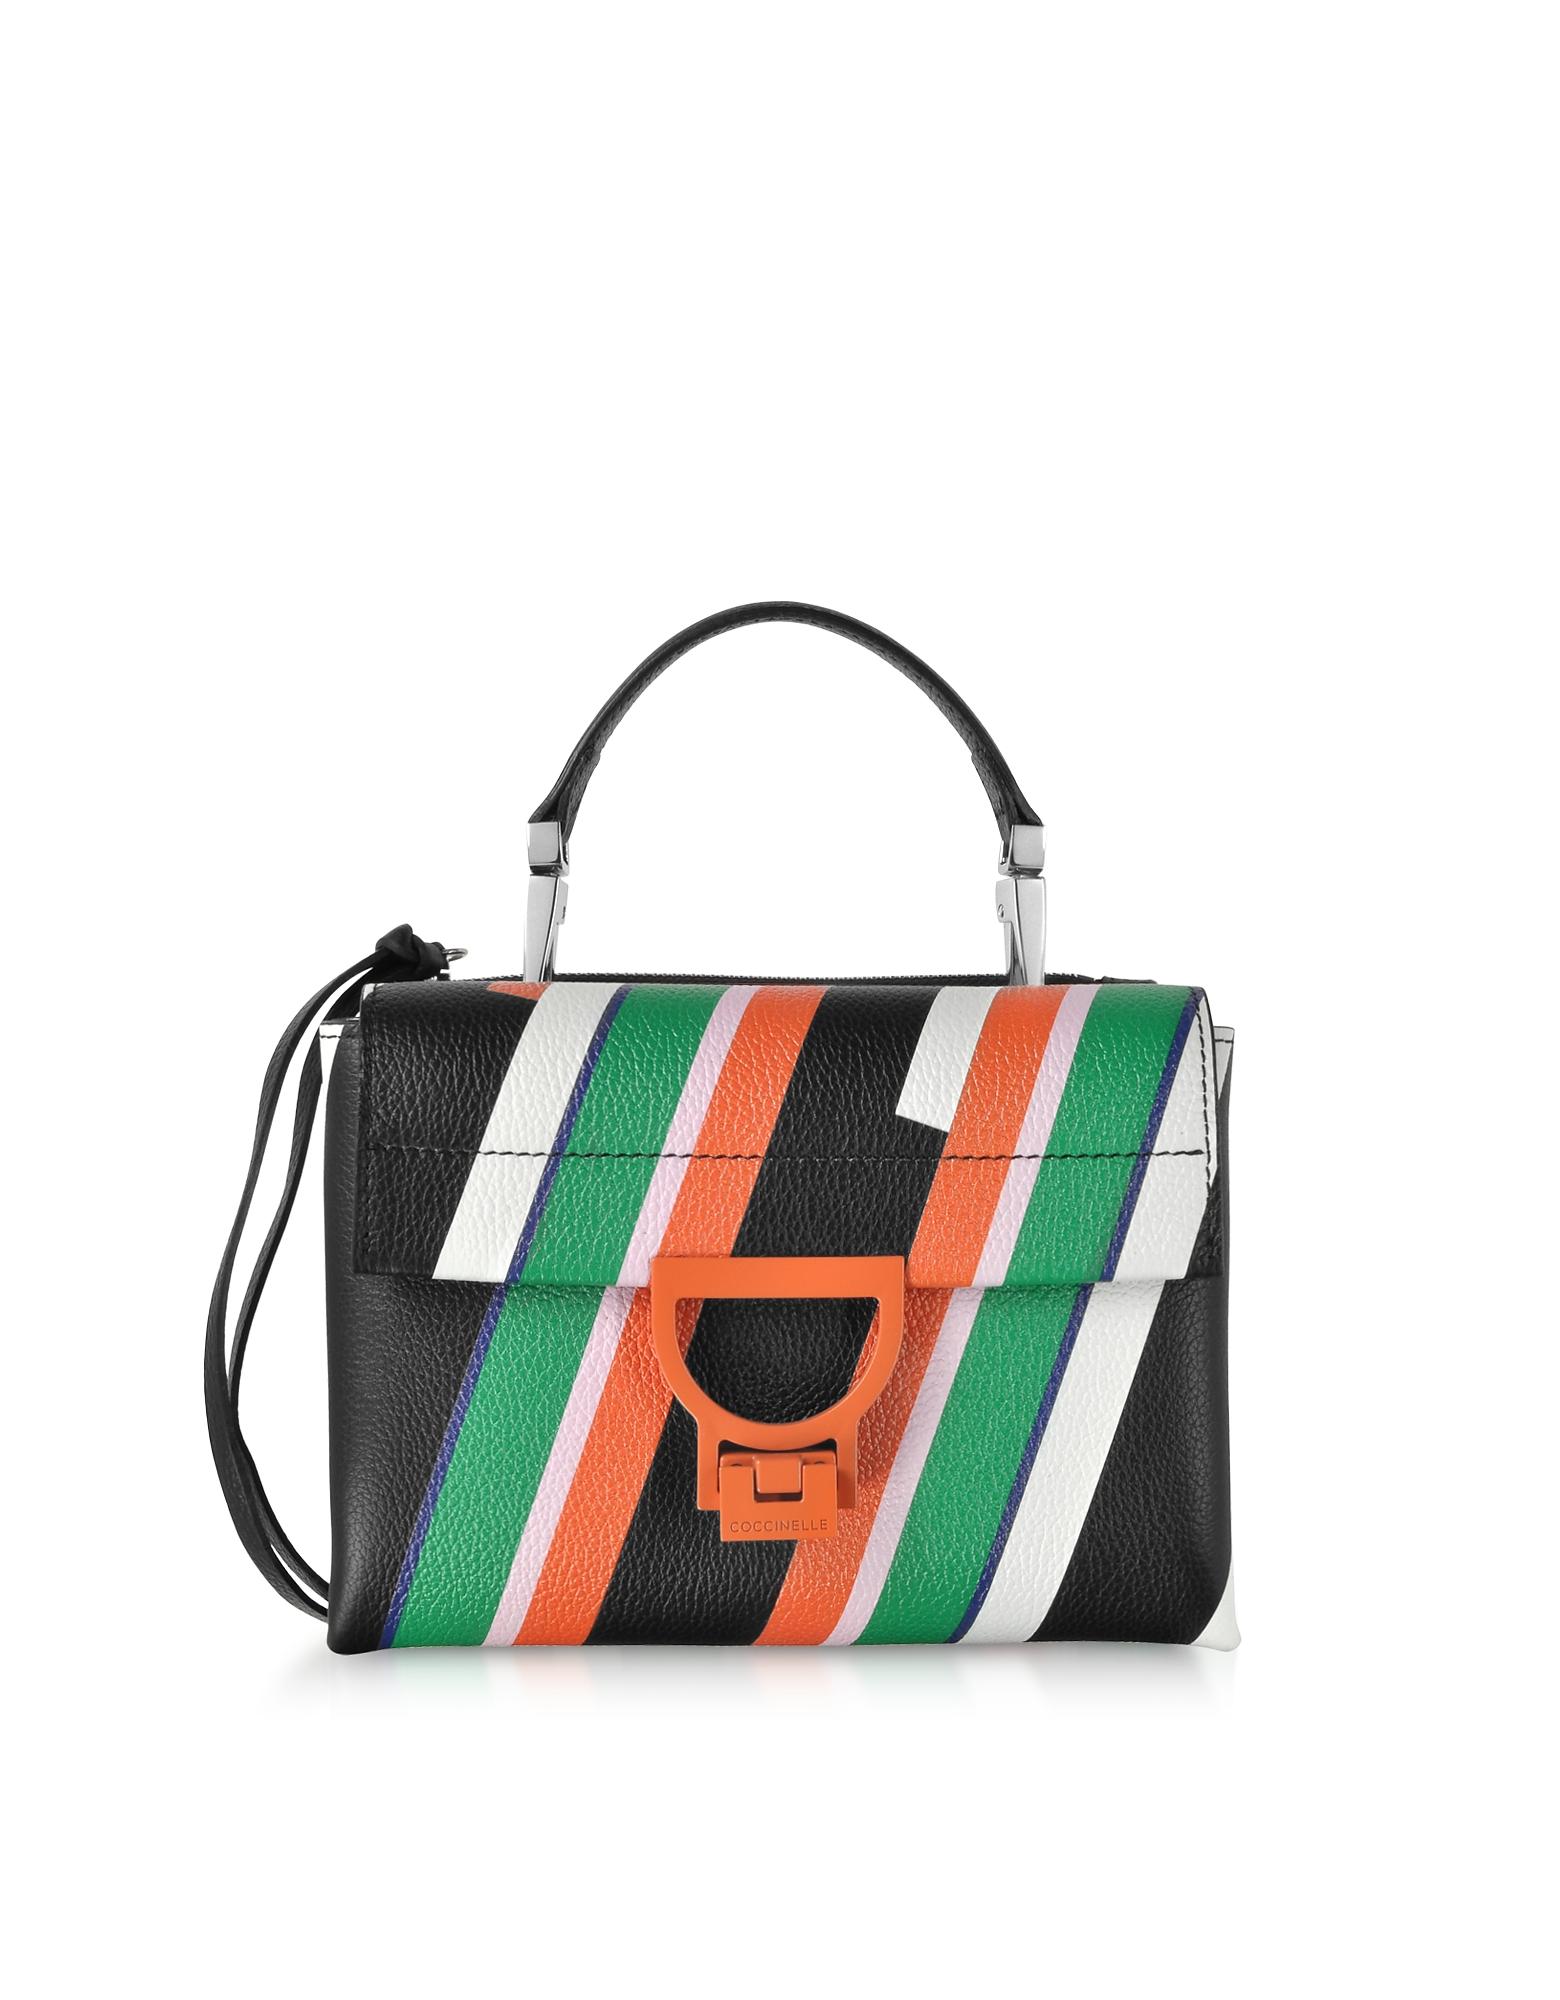 Coccinelle Handbags, Arlettis Stripes Mini Bag w/Shoulder Strap